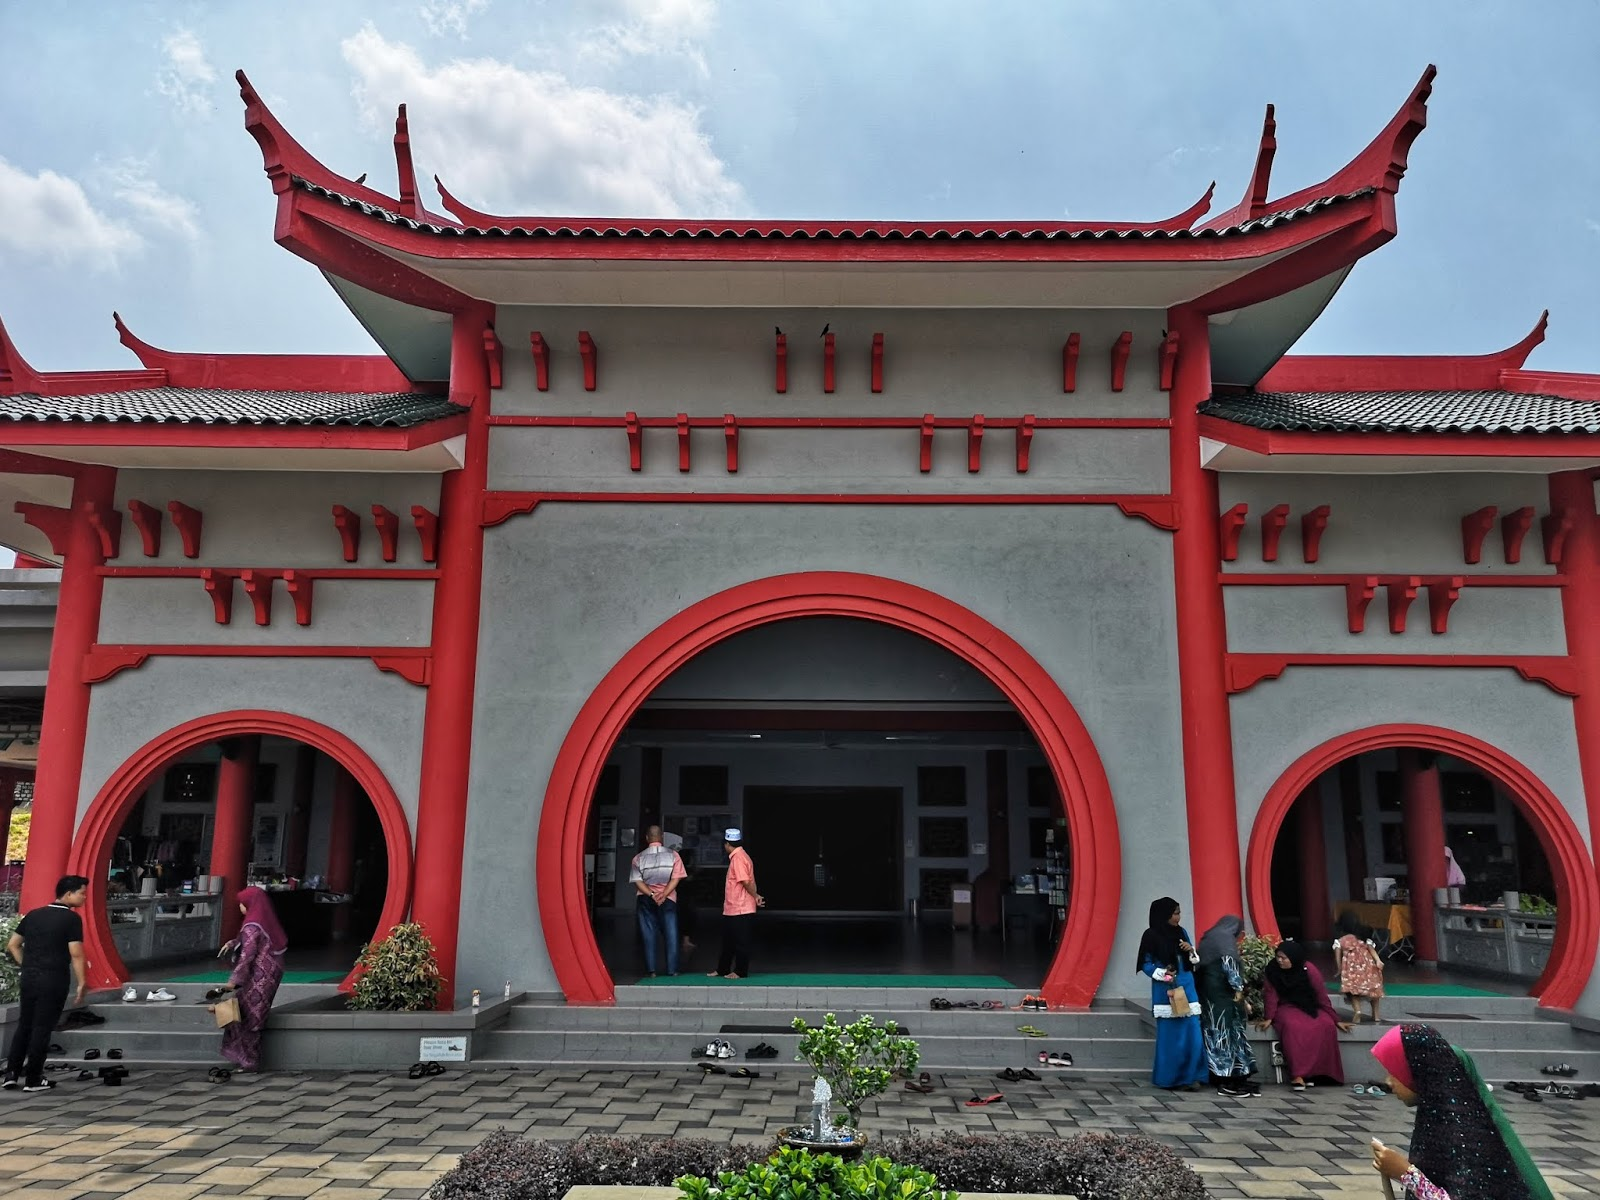 Masjid Cina Krubong, Melaka